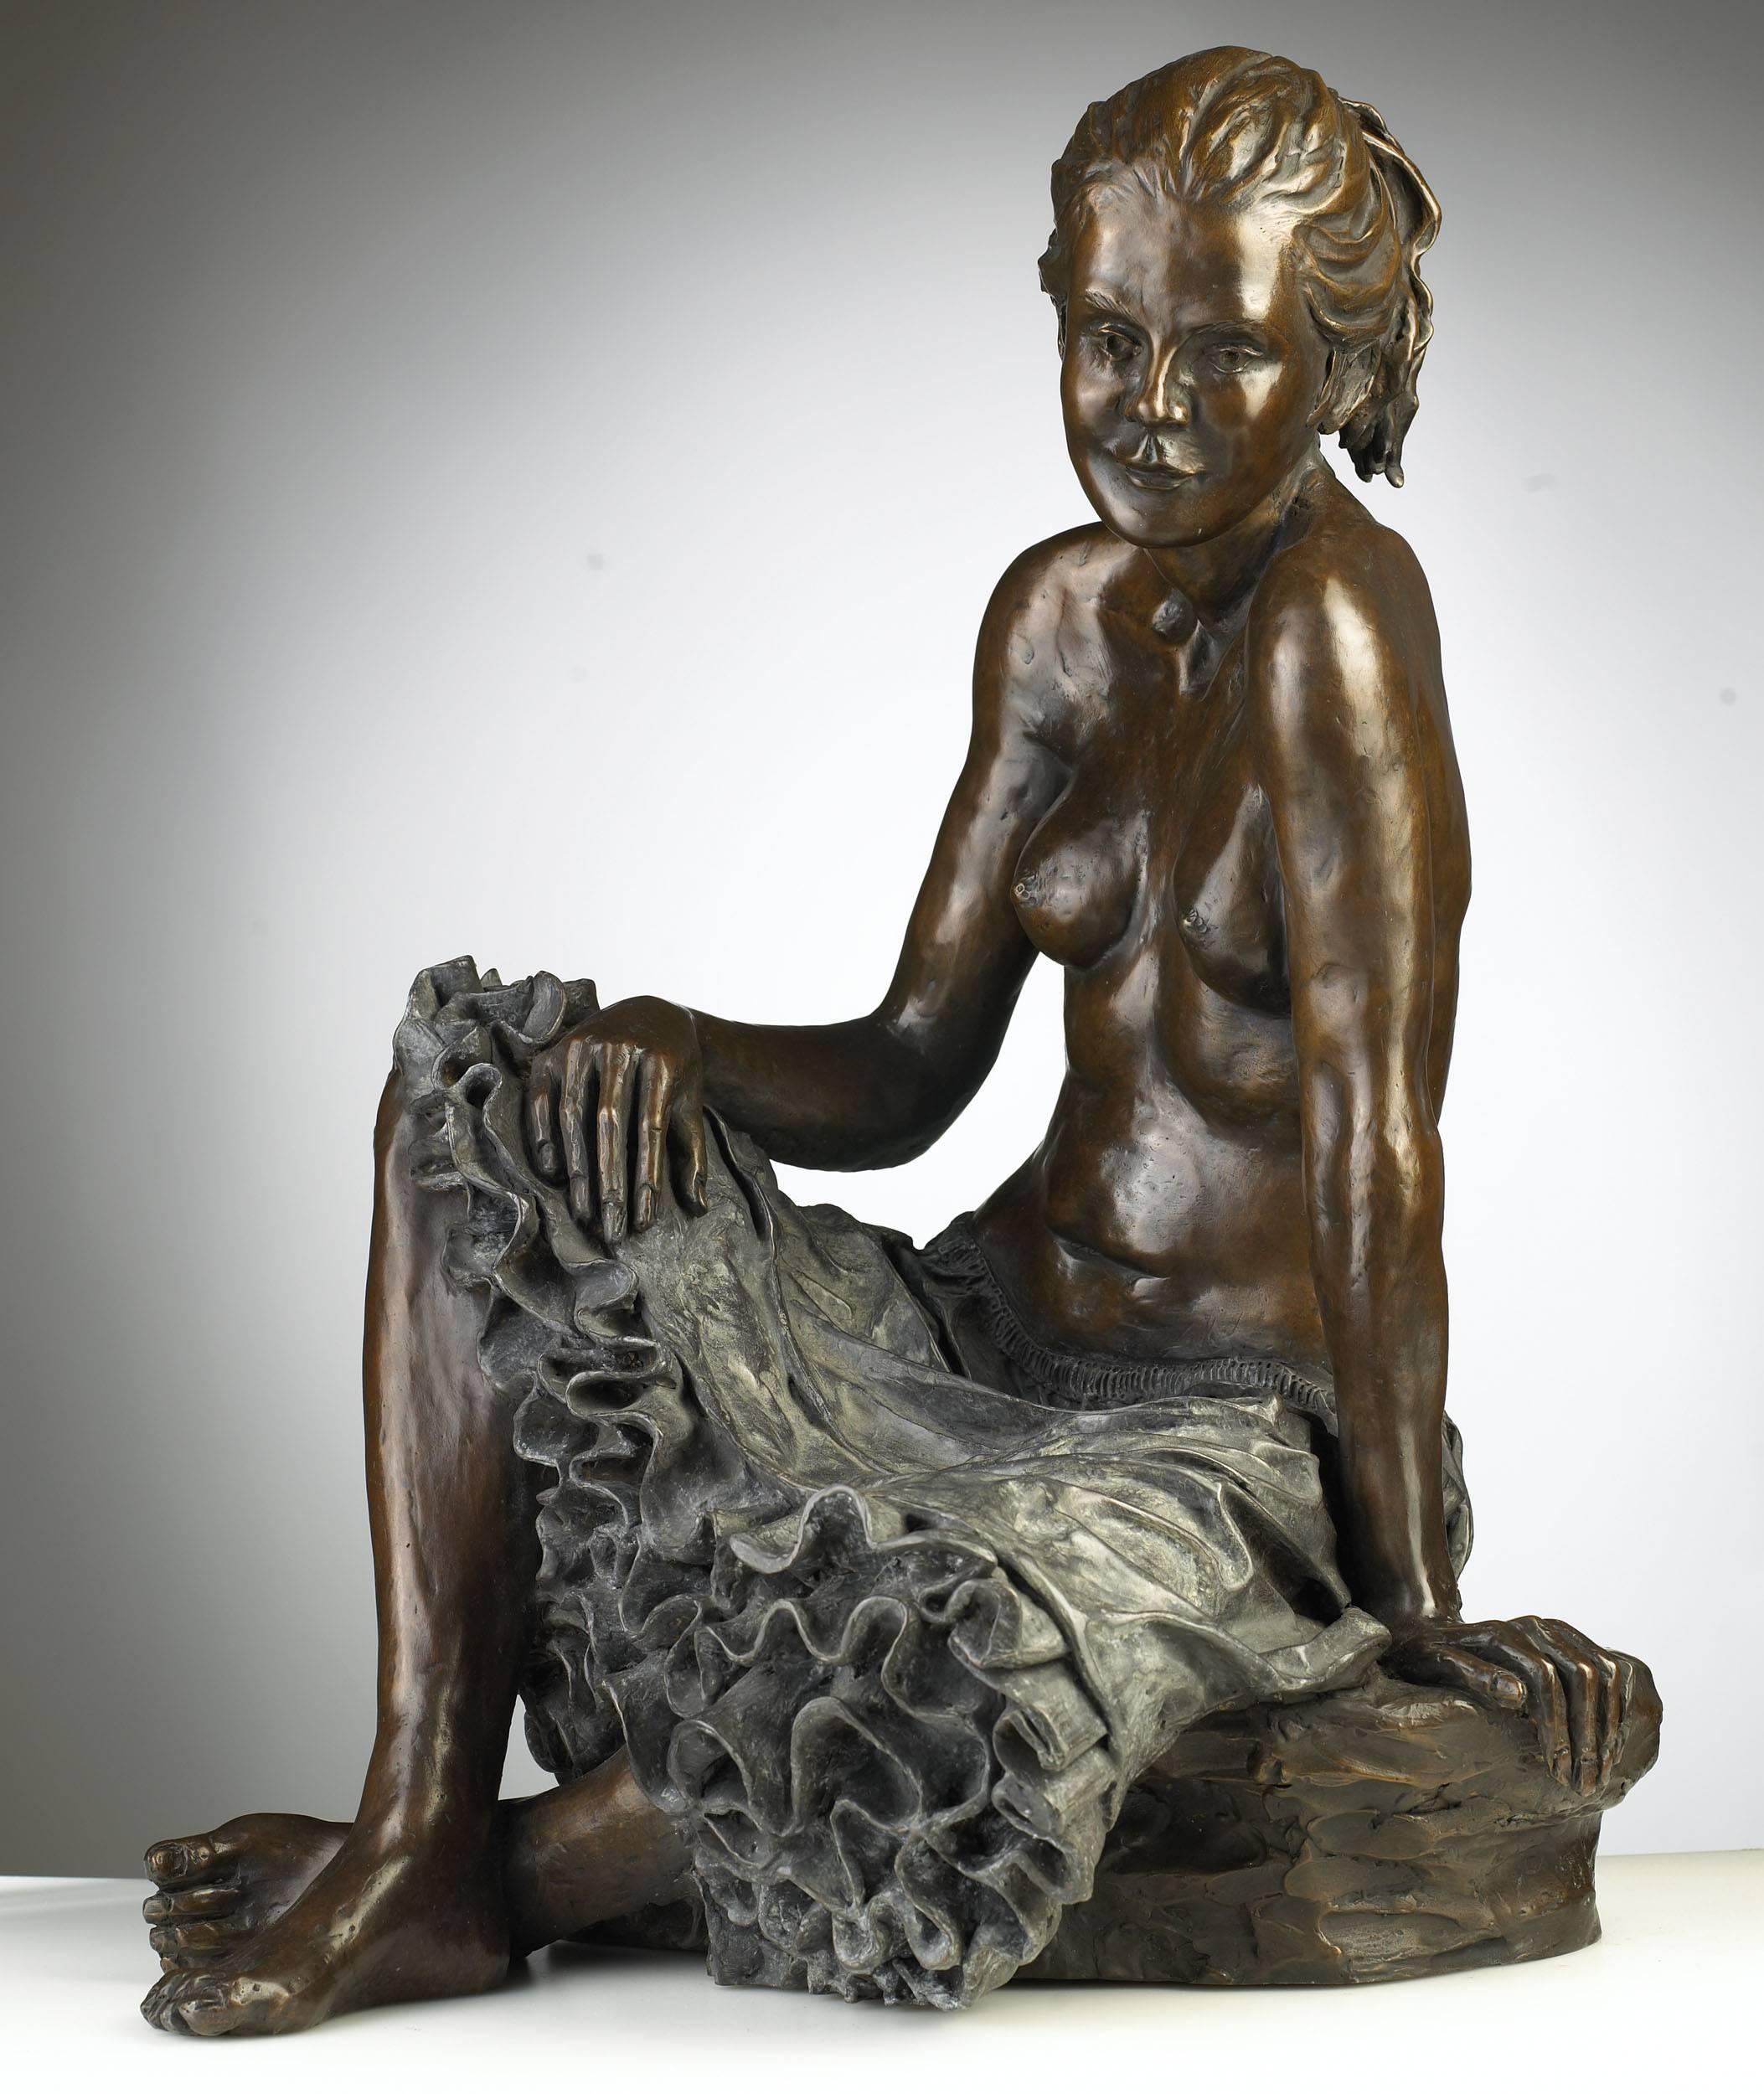 Solid Bronze Figurative Ballet Dancer Sculpture 'Petticoats' by Benson Landes